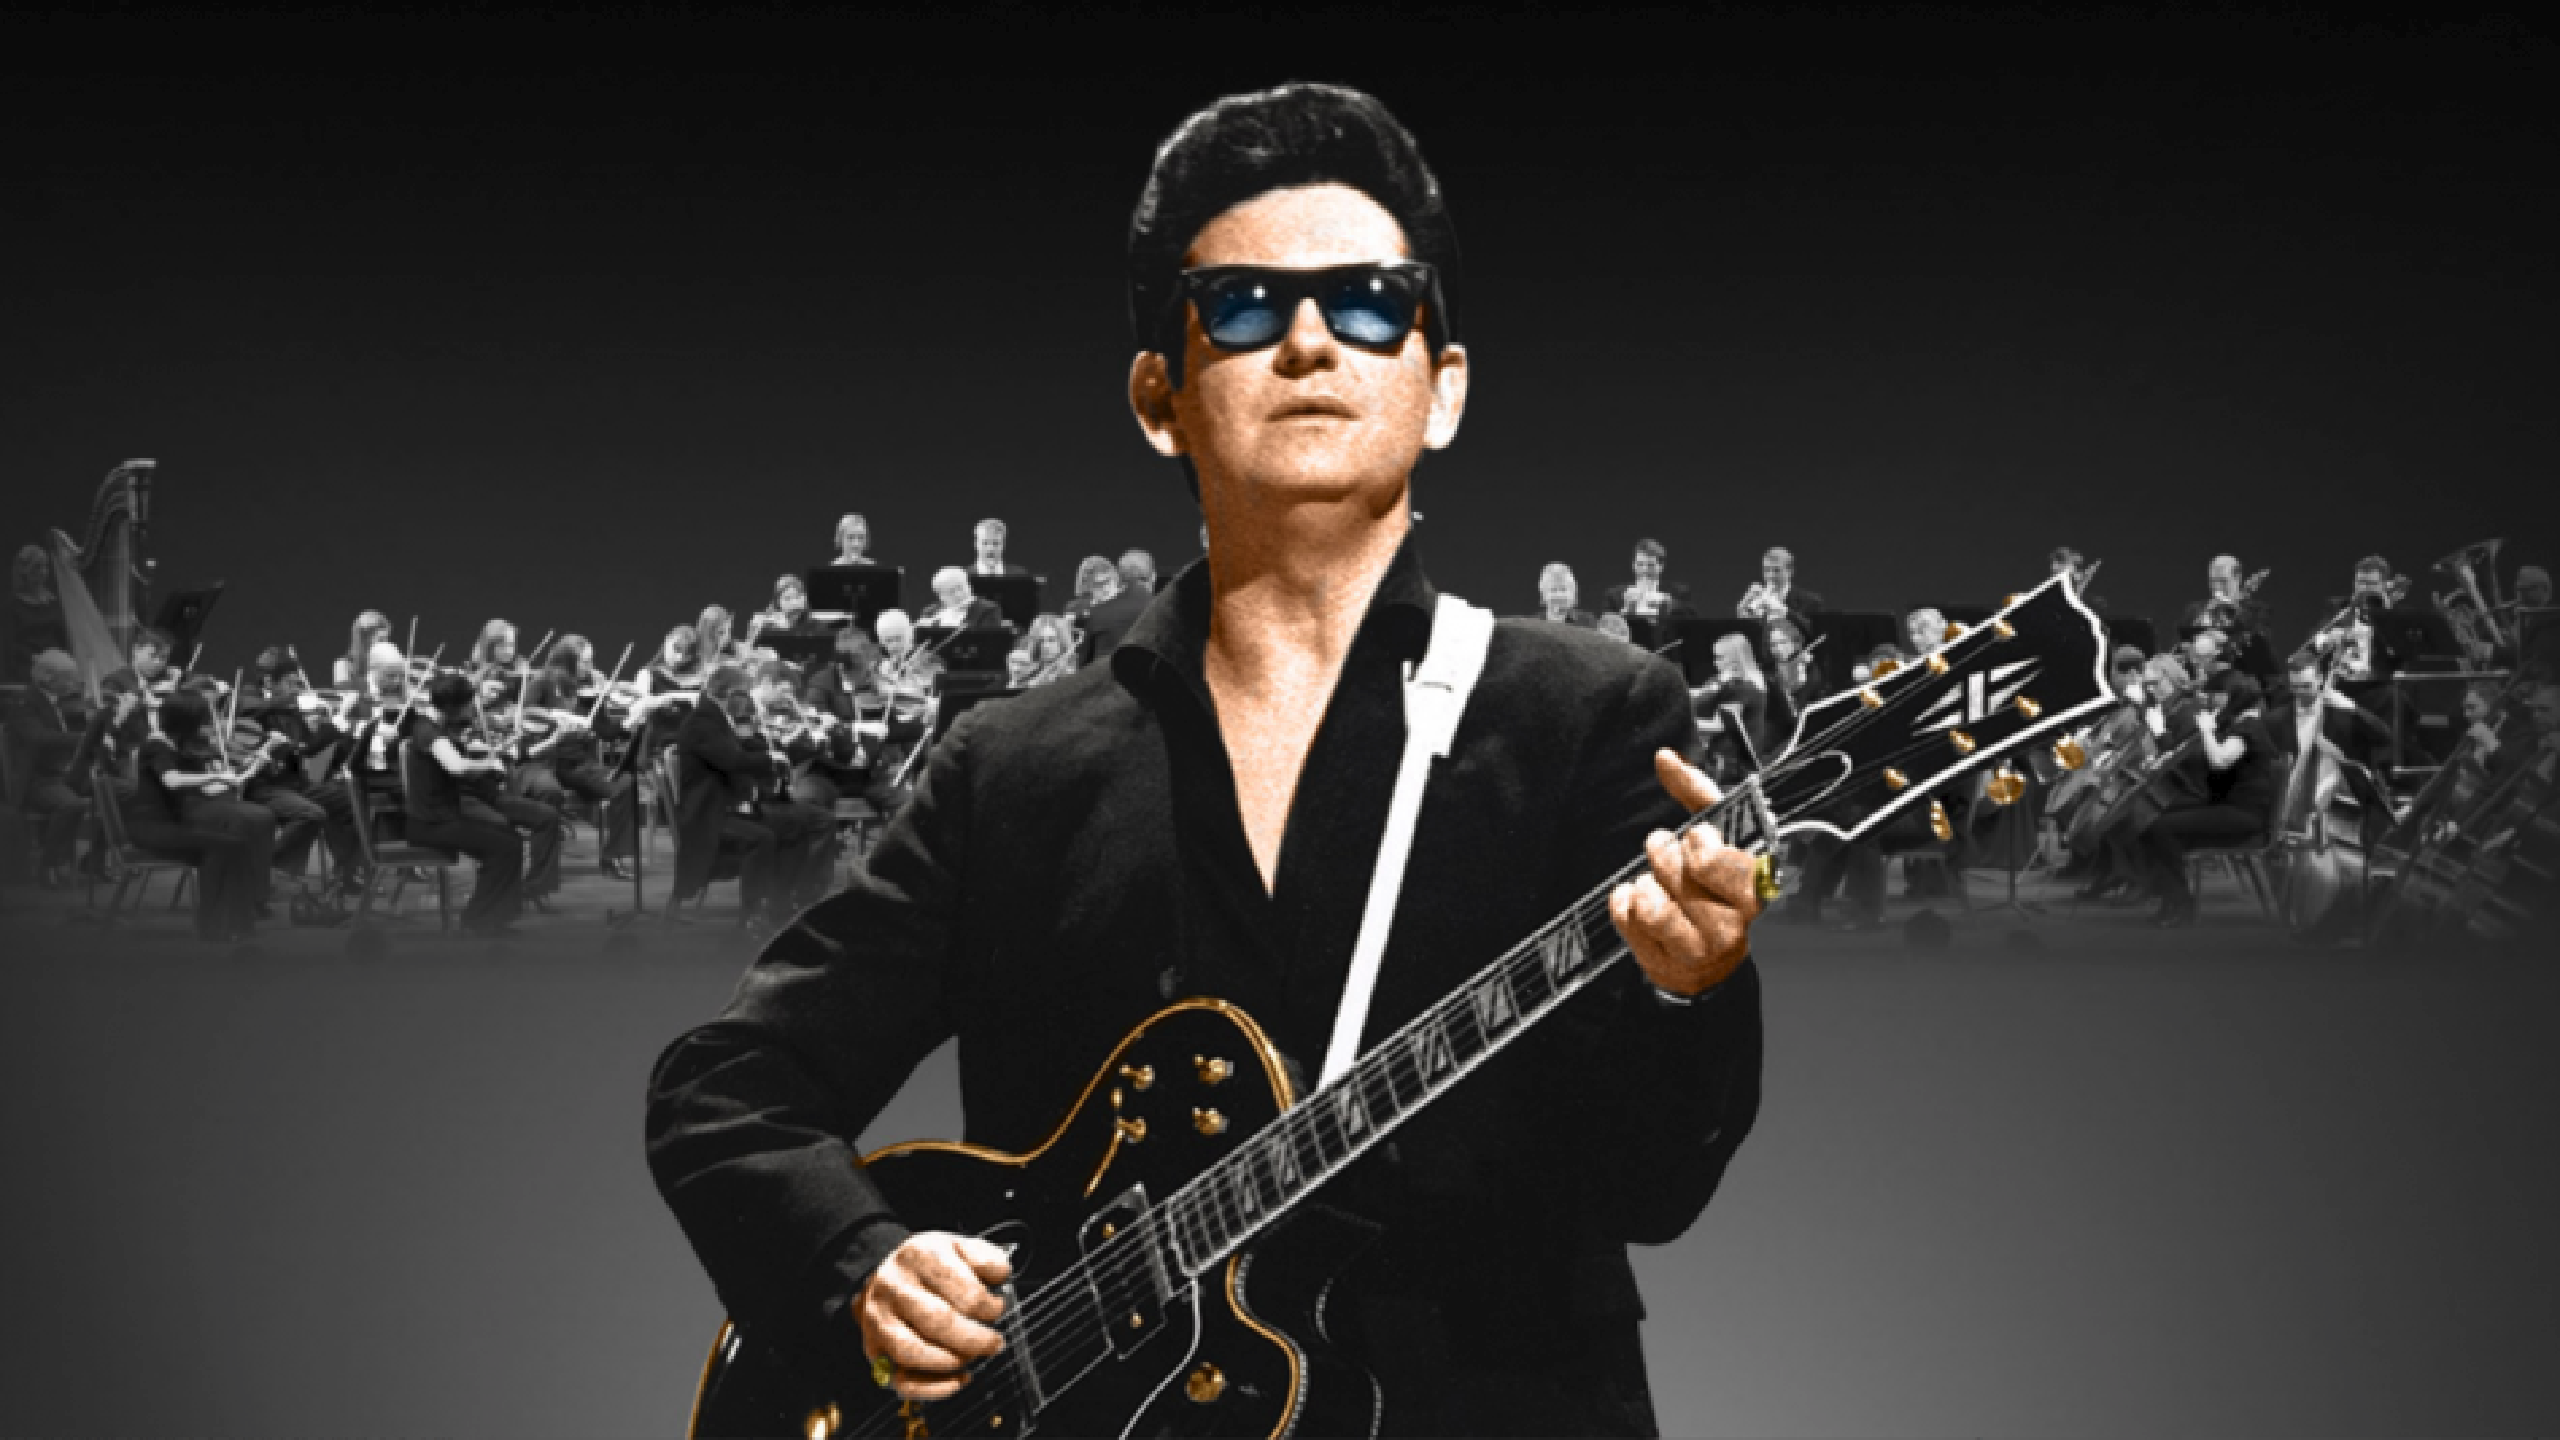 Roy Orbison In Dreams Tribute Fechas De Gira 2020 2021 Roy Orbison In Dreams Tribute Entradas Y Conciertos Wegow